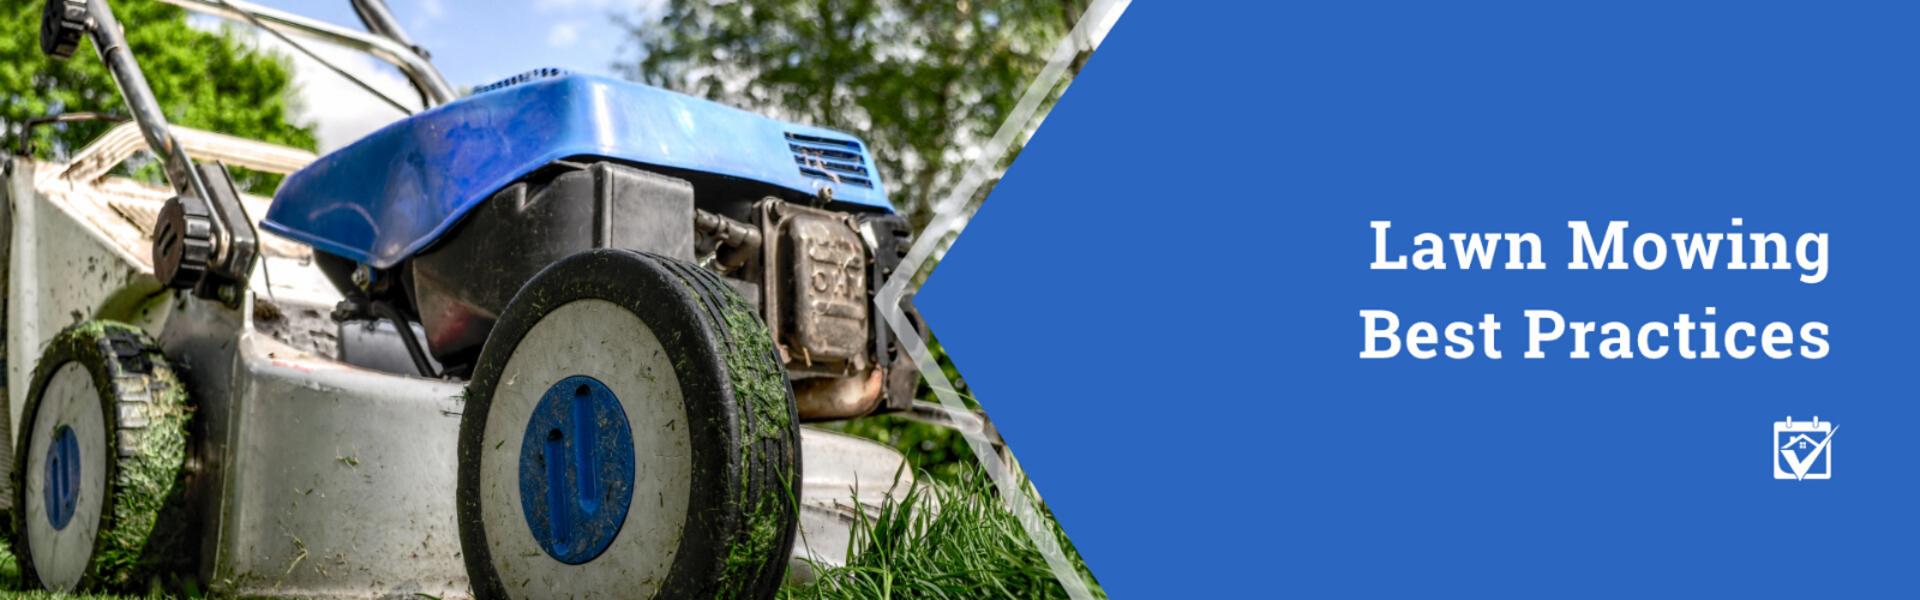 Lawn Mowing Best Practices